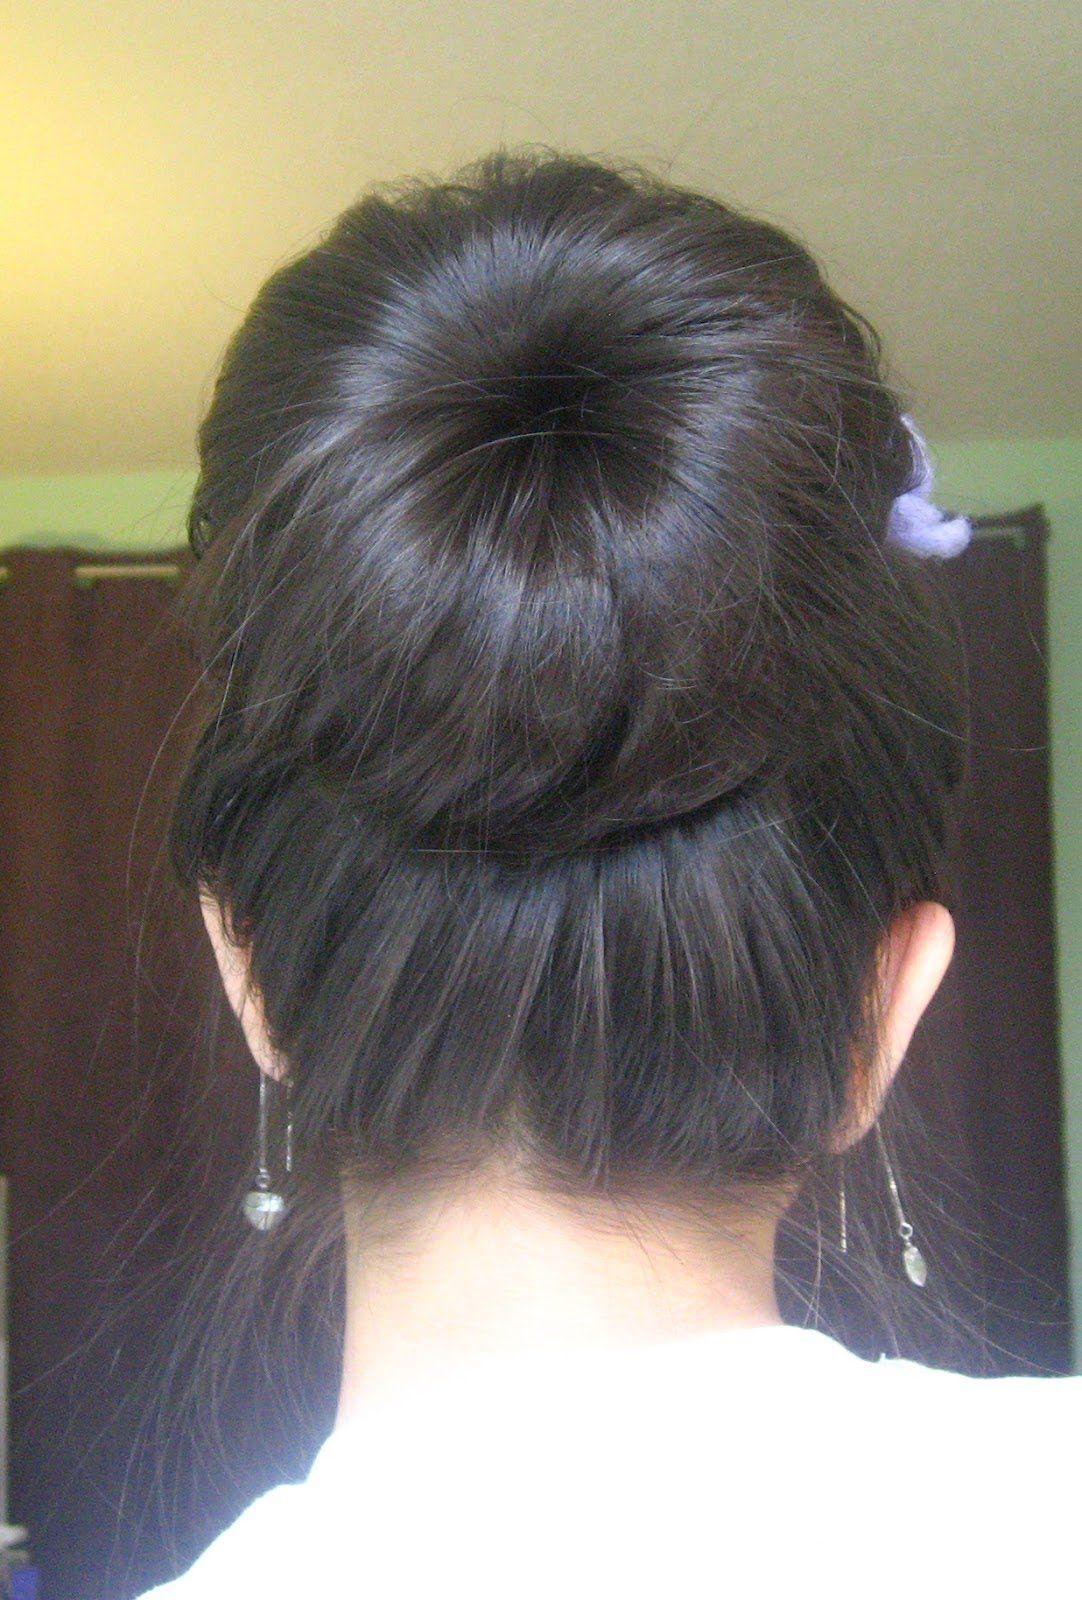 Sock bun hair tutorial for long fine hair my stuff hair sock bun hair tutorial for long fine hair pmusecretfo Choice Image